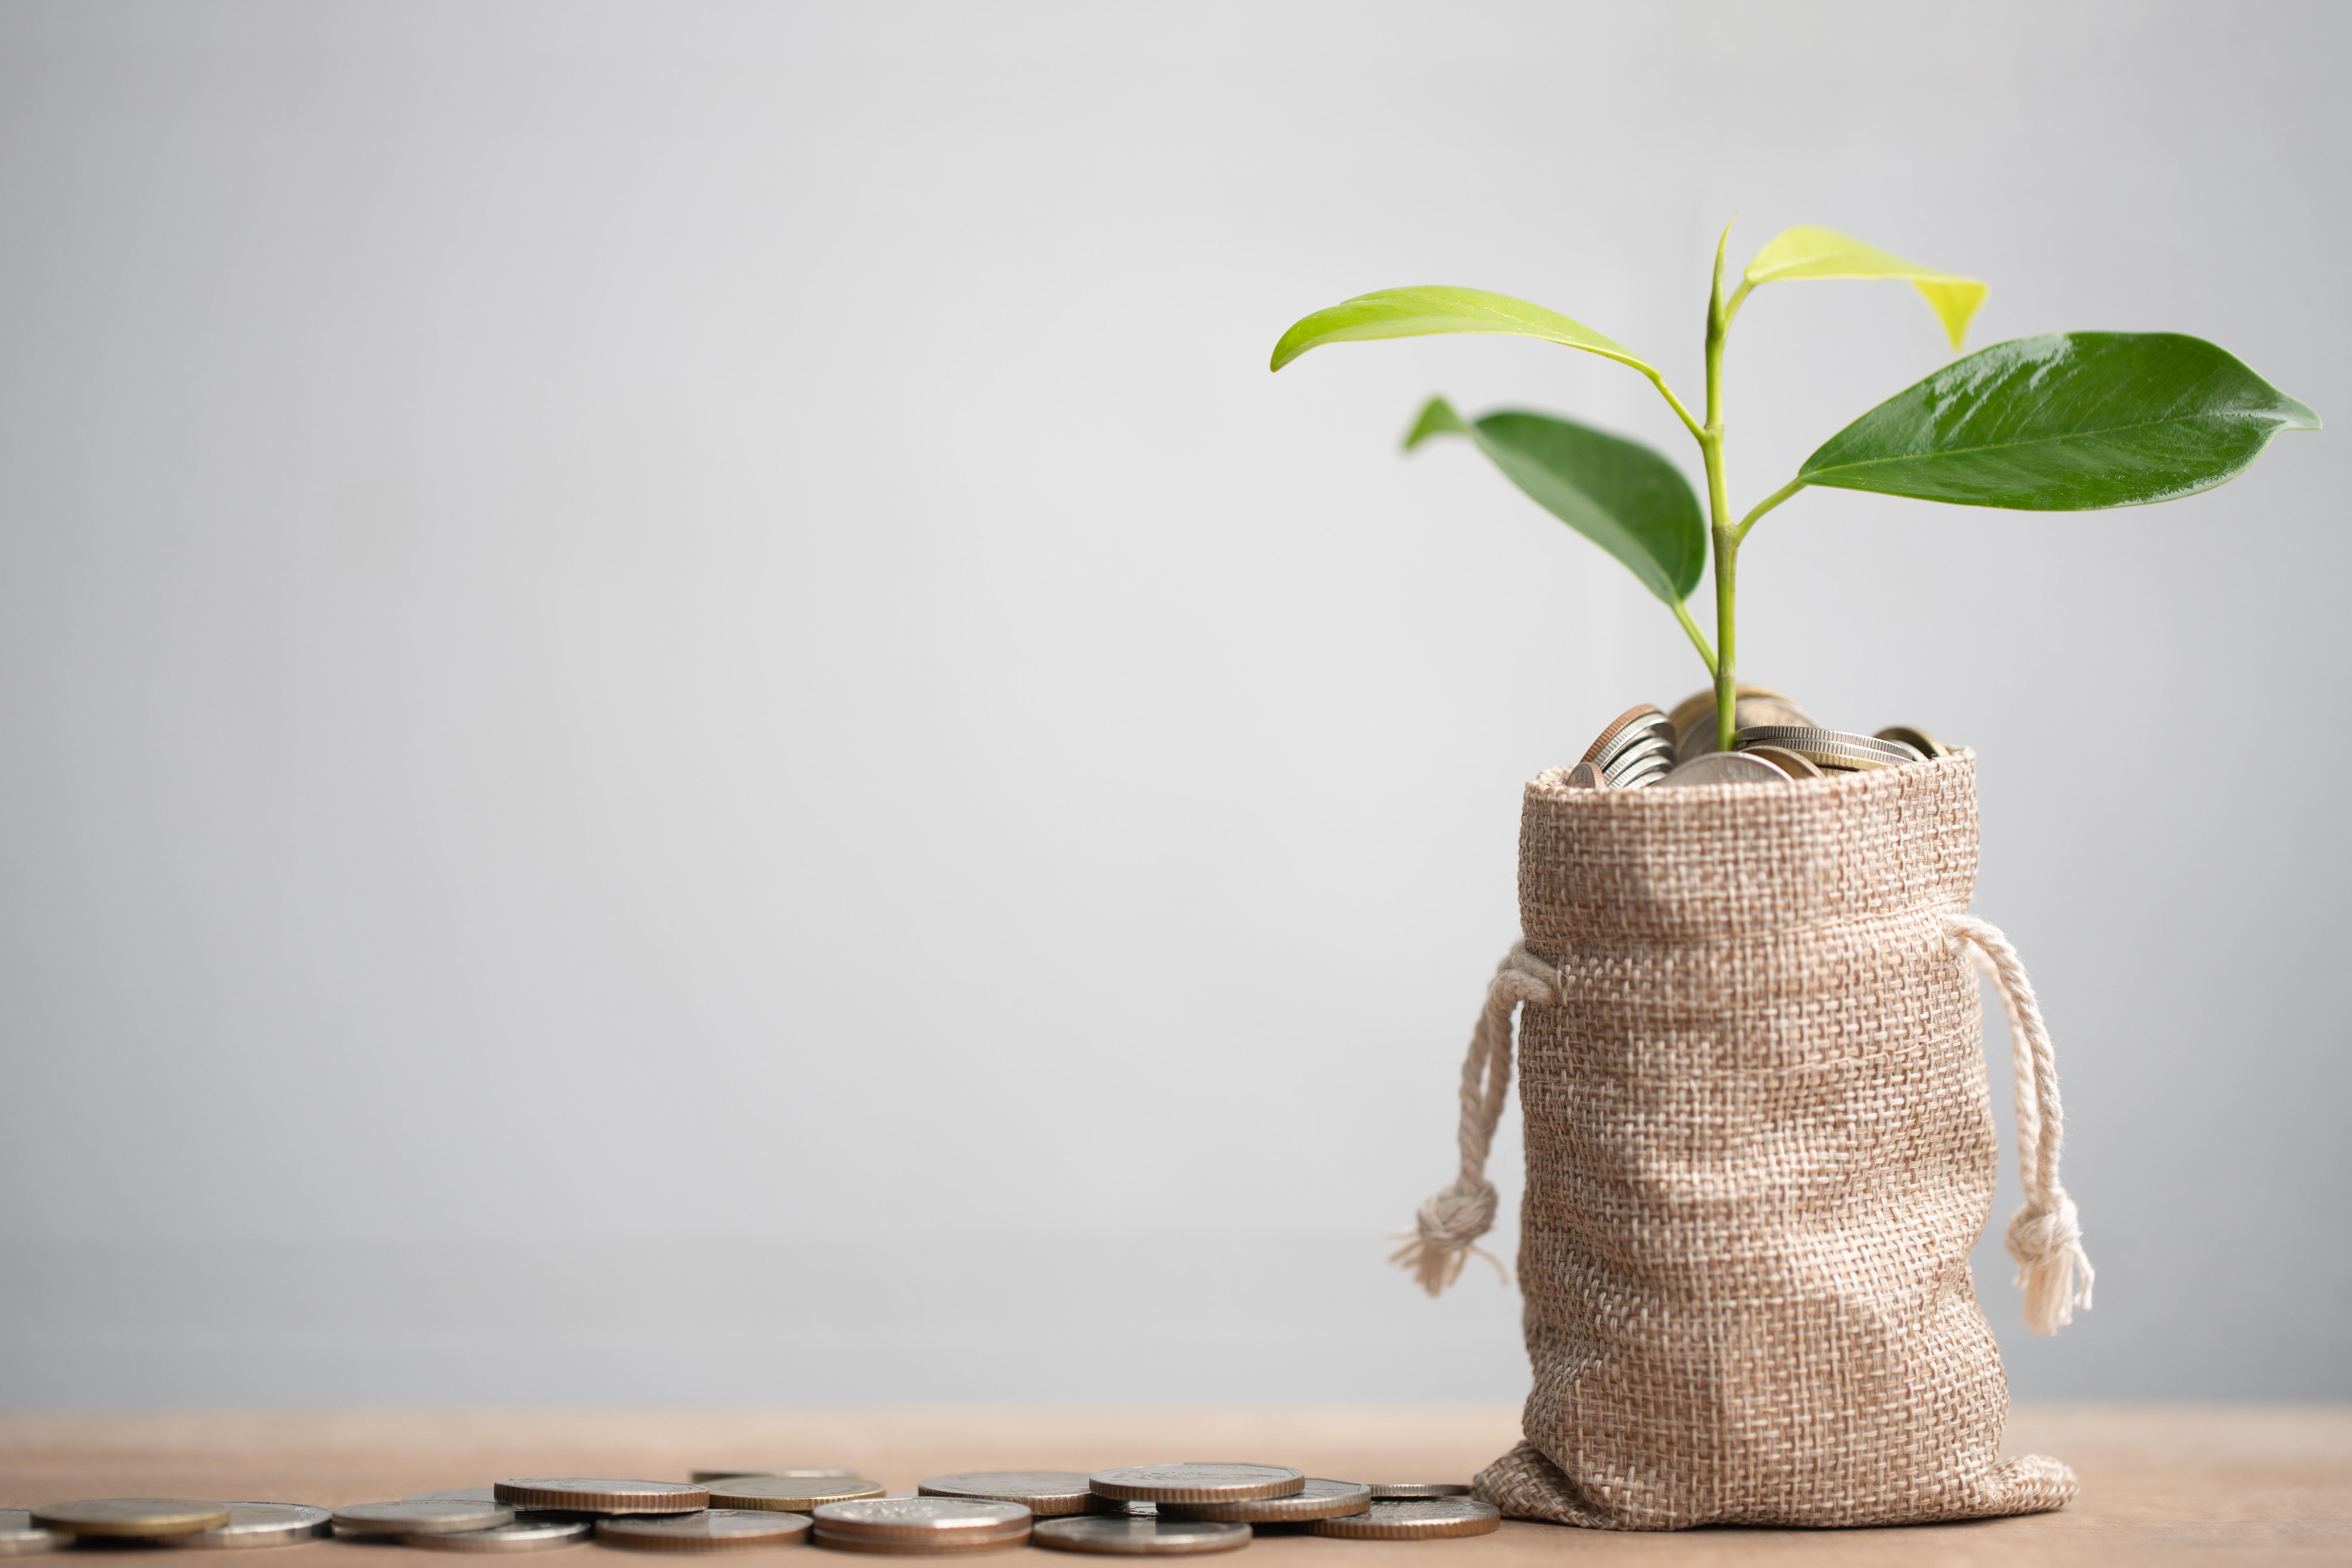 Liontrust ESG Trust names board of directors - Money Marketing